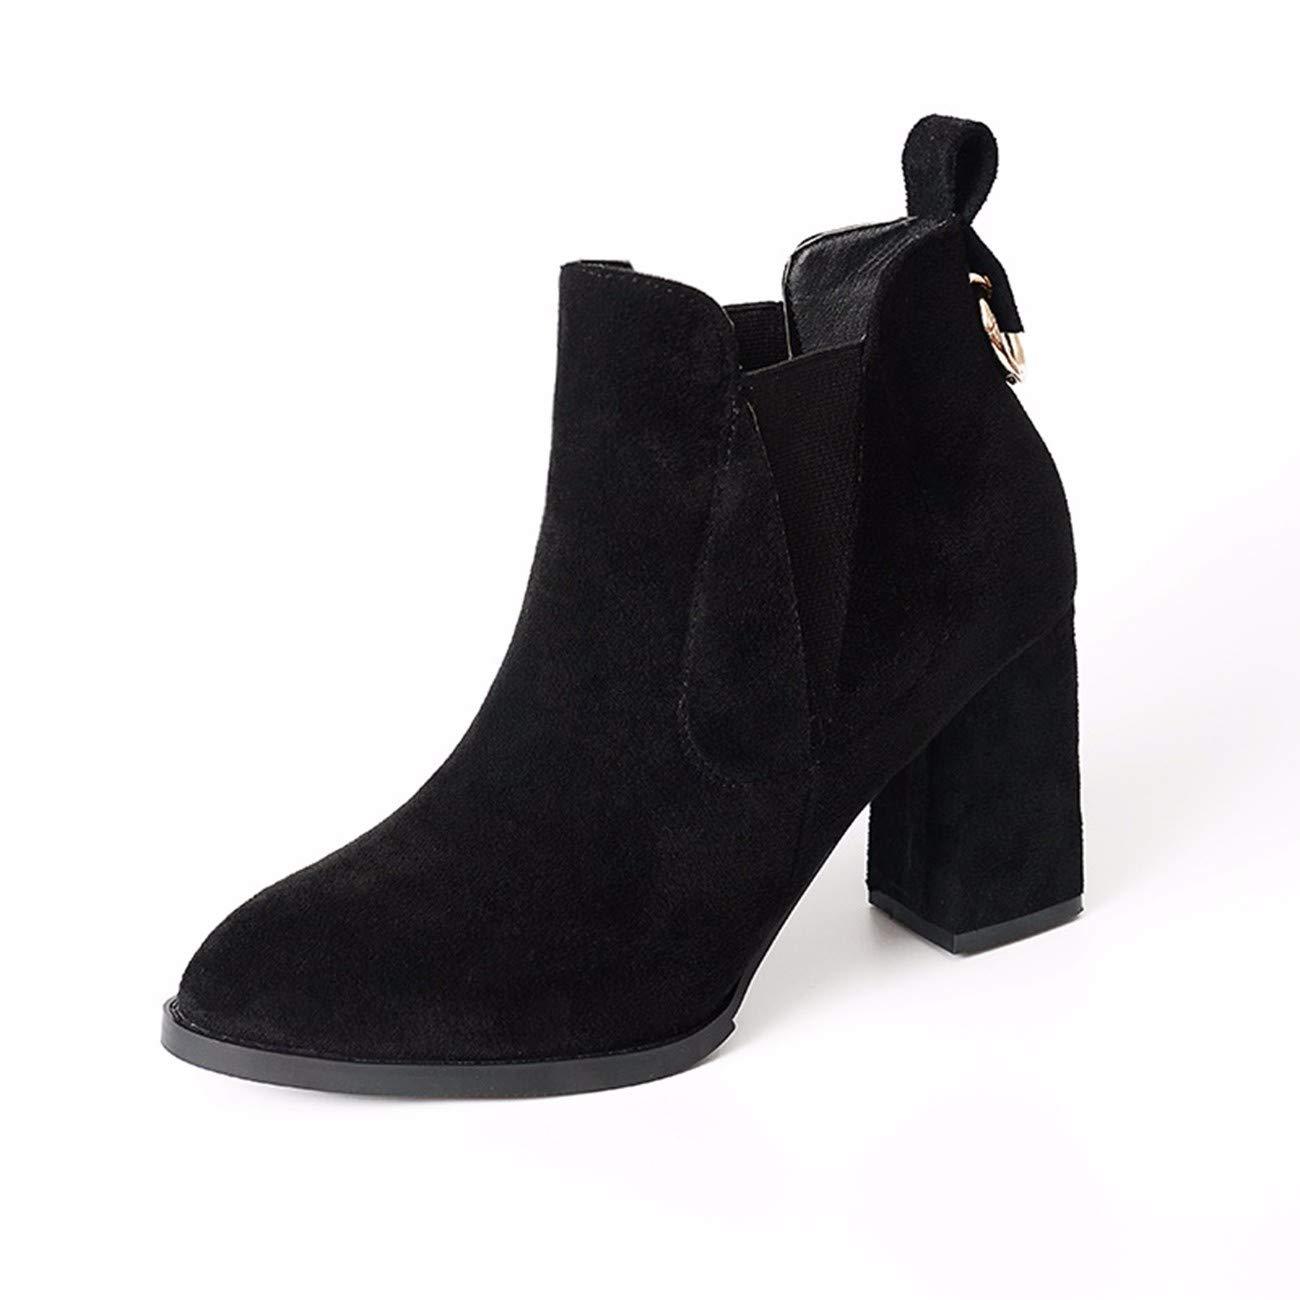 QPGGP-Stiefel Damen Stiefel & Stiefeletten A - Größe  EU40 UK8 US10